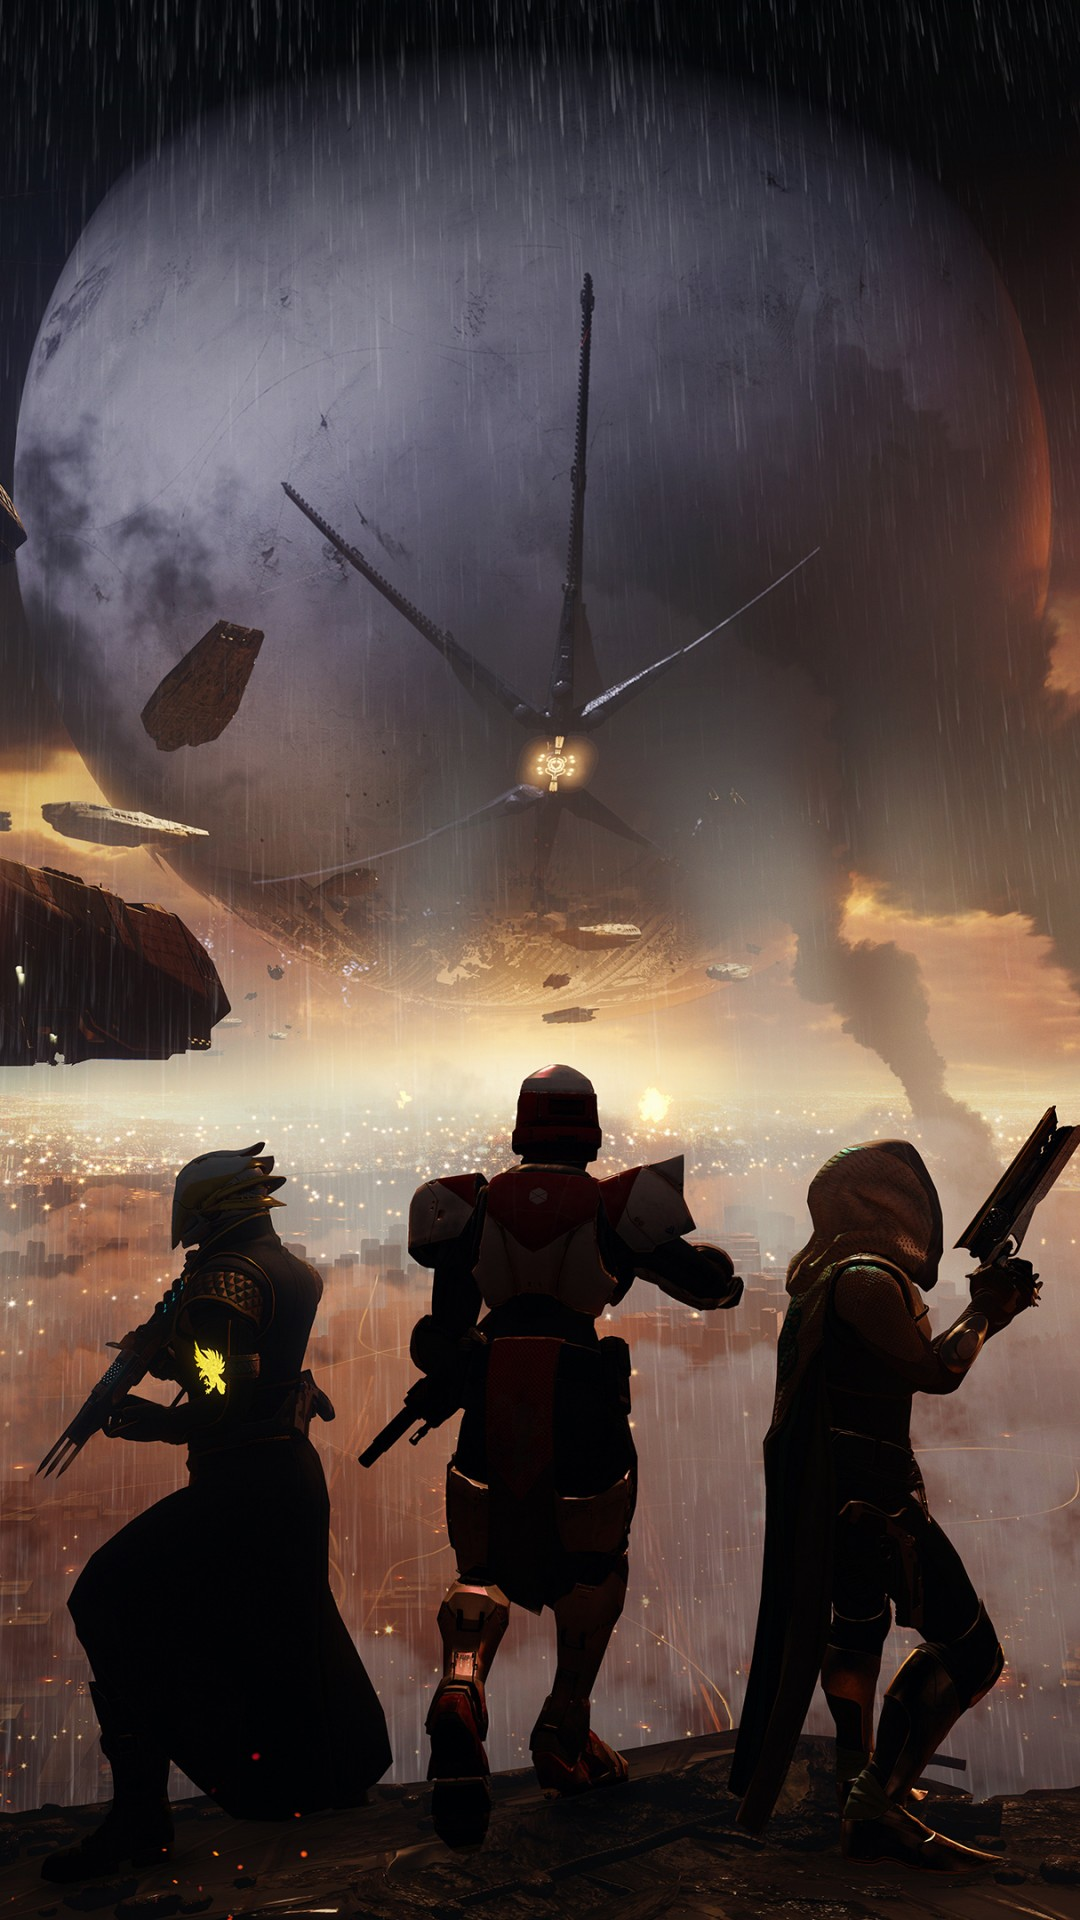 Wallpaper Destiny 2, 4k, E3 2017, screenshot, Games #14695